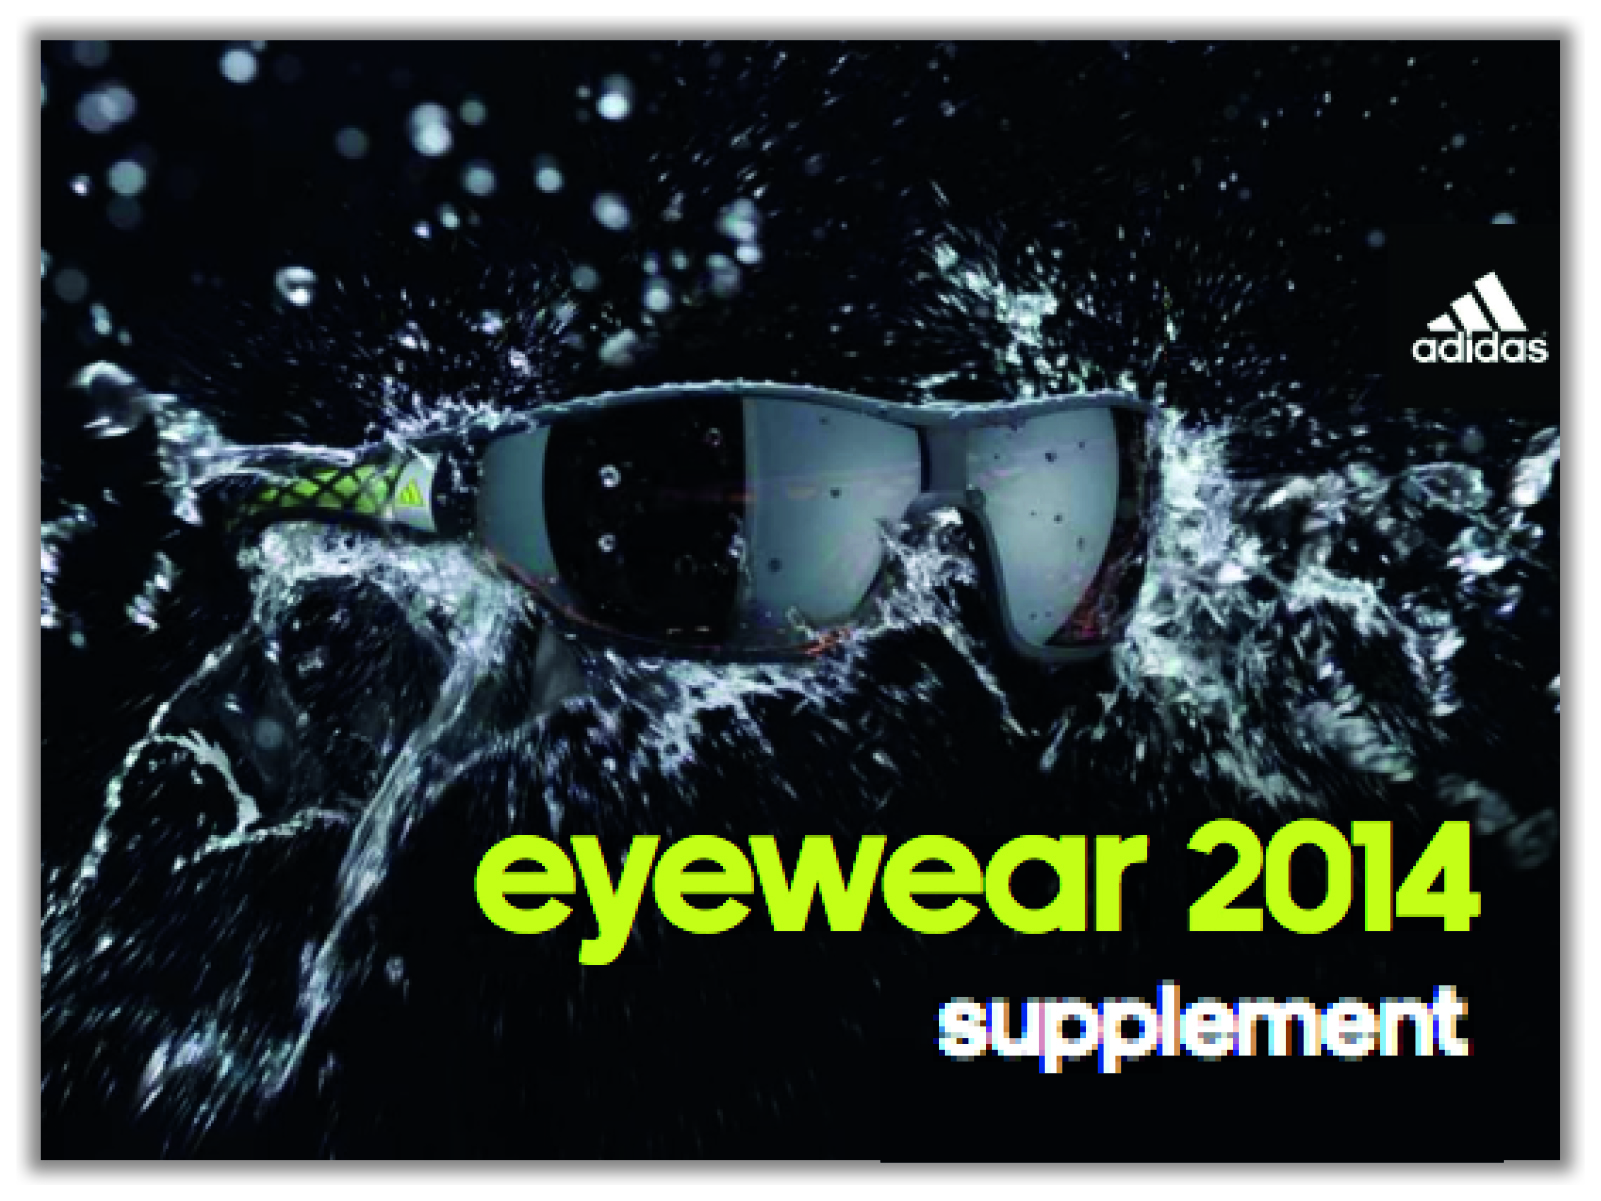 Adidas_Suplemento2014-1